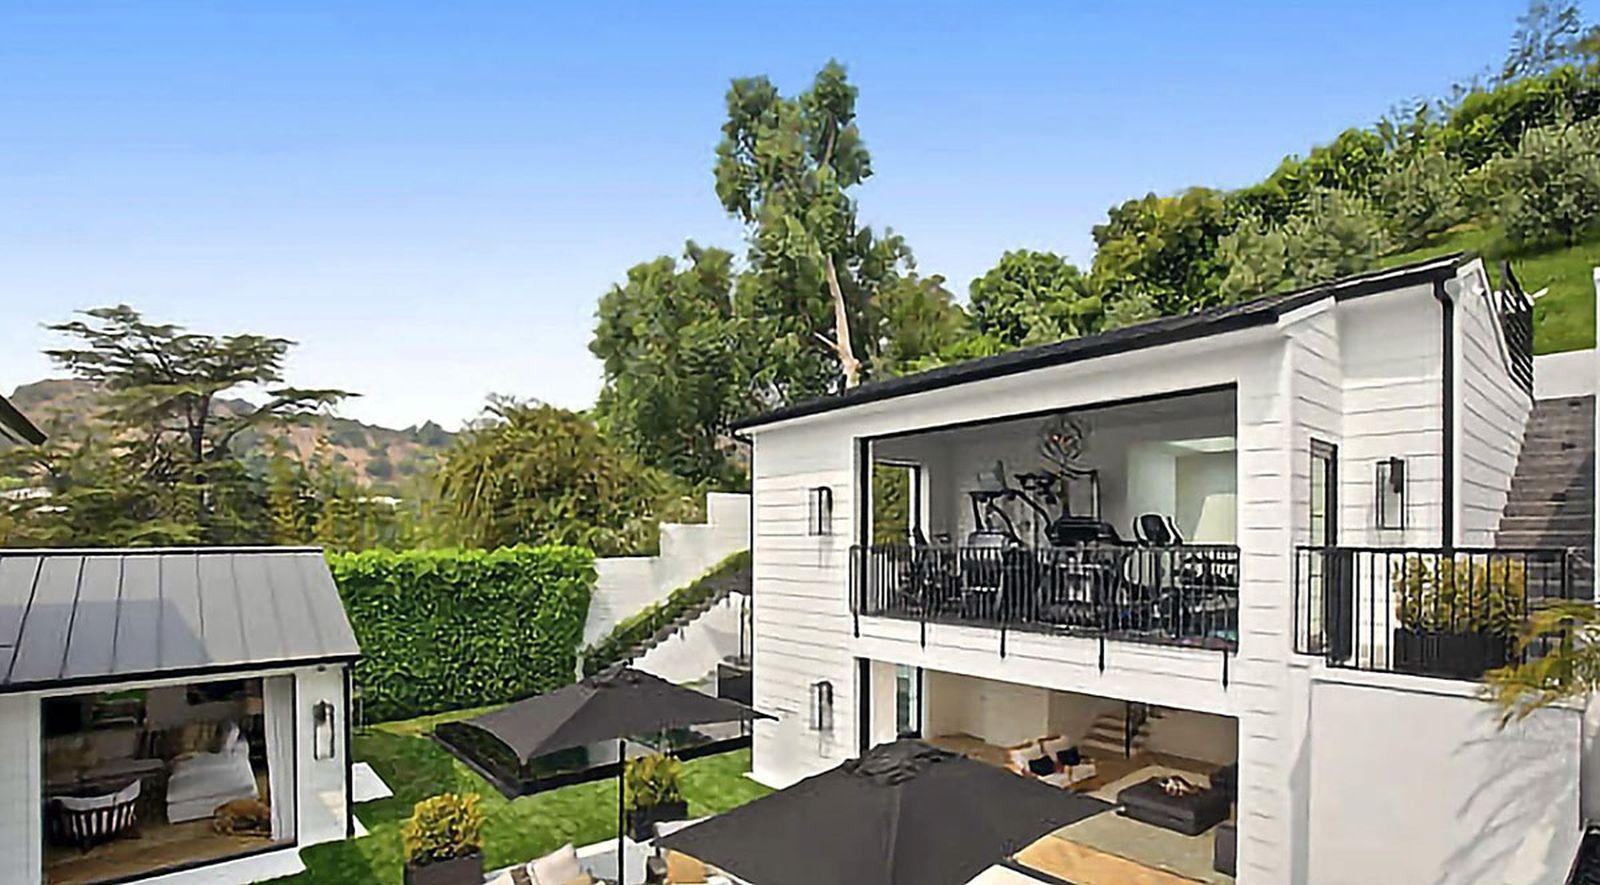 Rihanna Buys $ 13.8 Million Dollar Beverly Hills Mansion